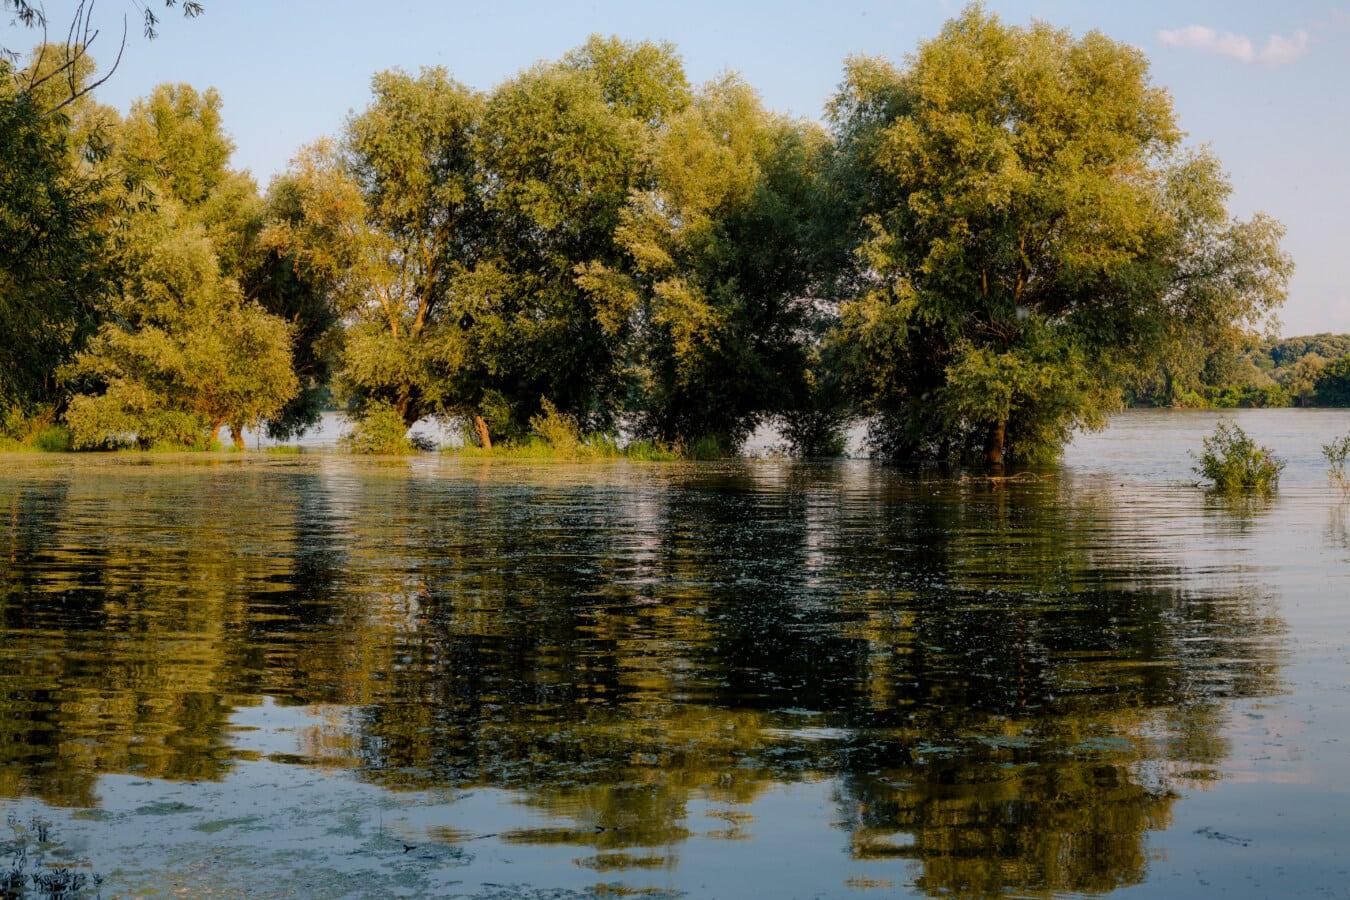 Aue, Flussufer, Fluss, Flut, Frühling, Landschaft, Struktur, Wasser, See, Anlage